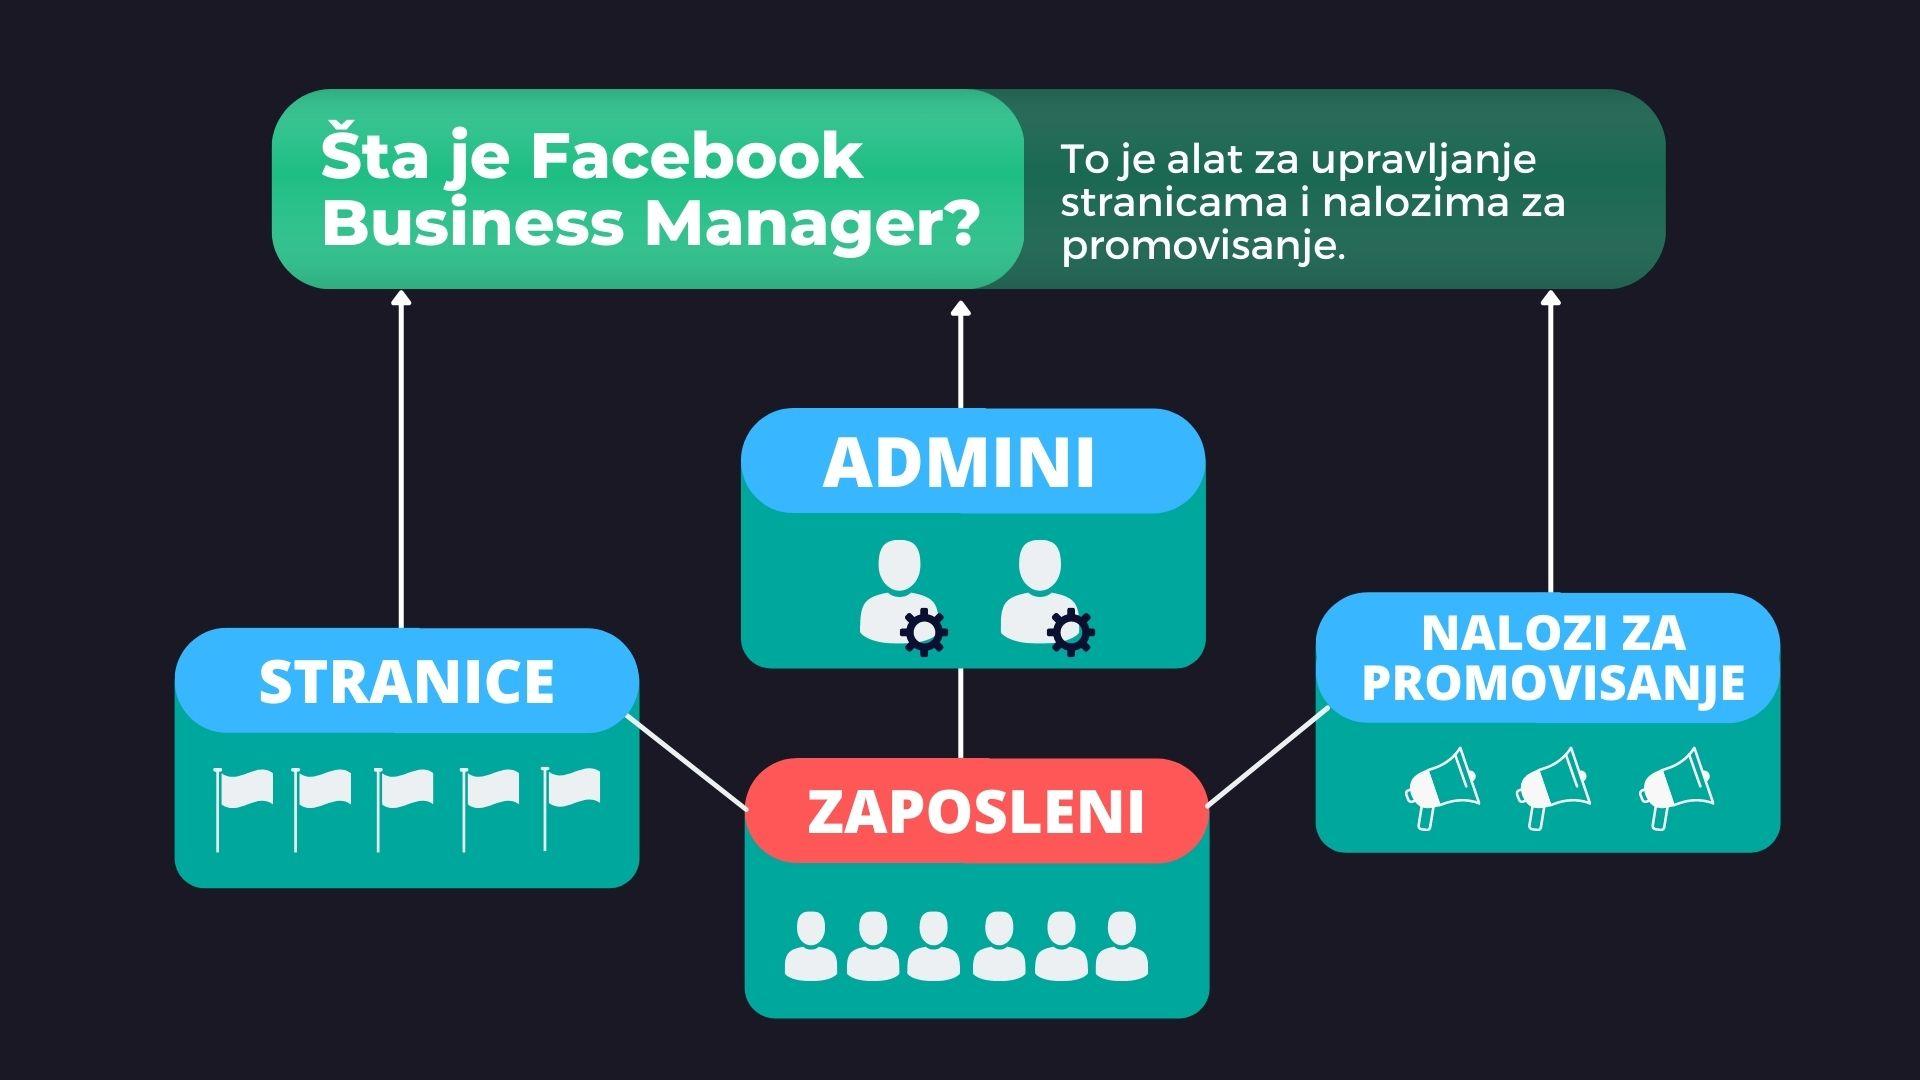 Šta je Facebook Business Manager?